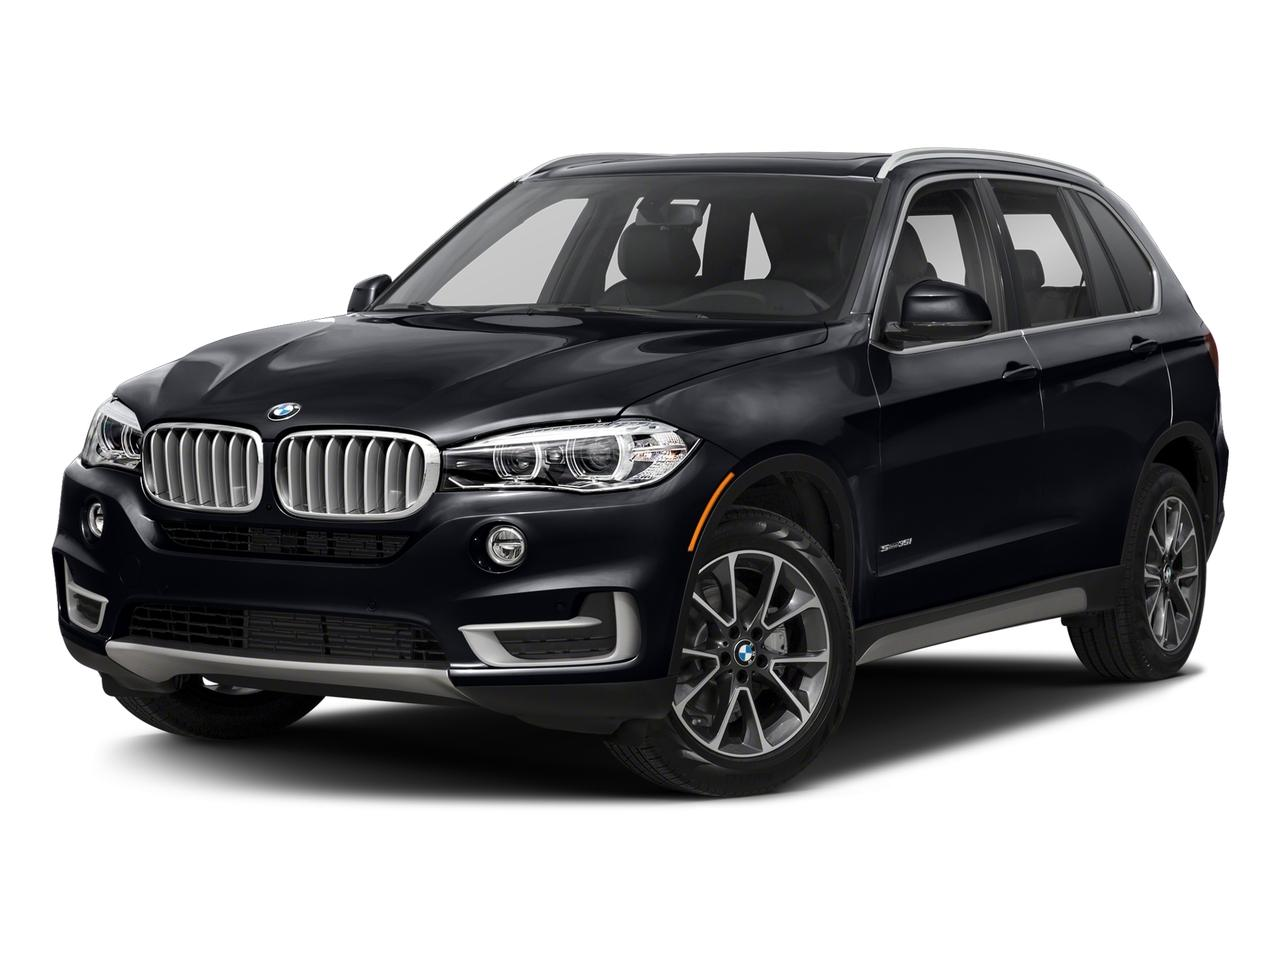 2018 BMW X5 xDrive50i Vehicle Photo in Charleston, SC 29407